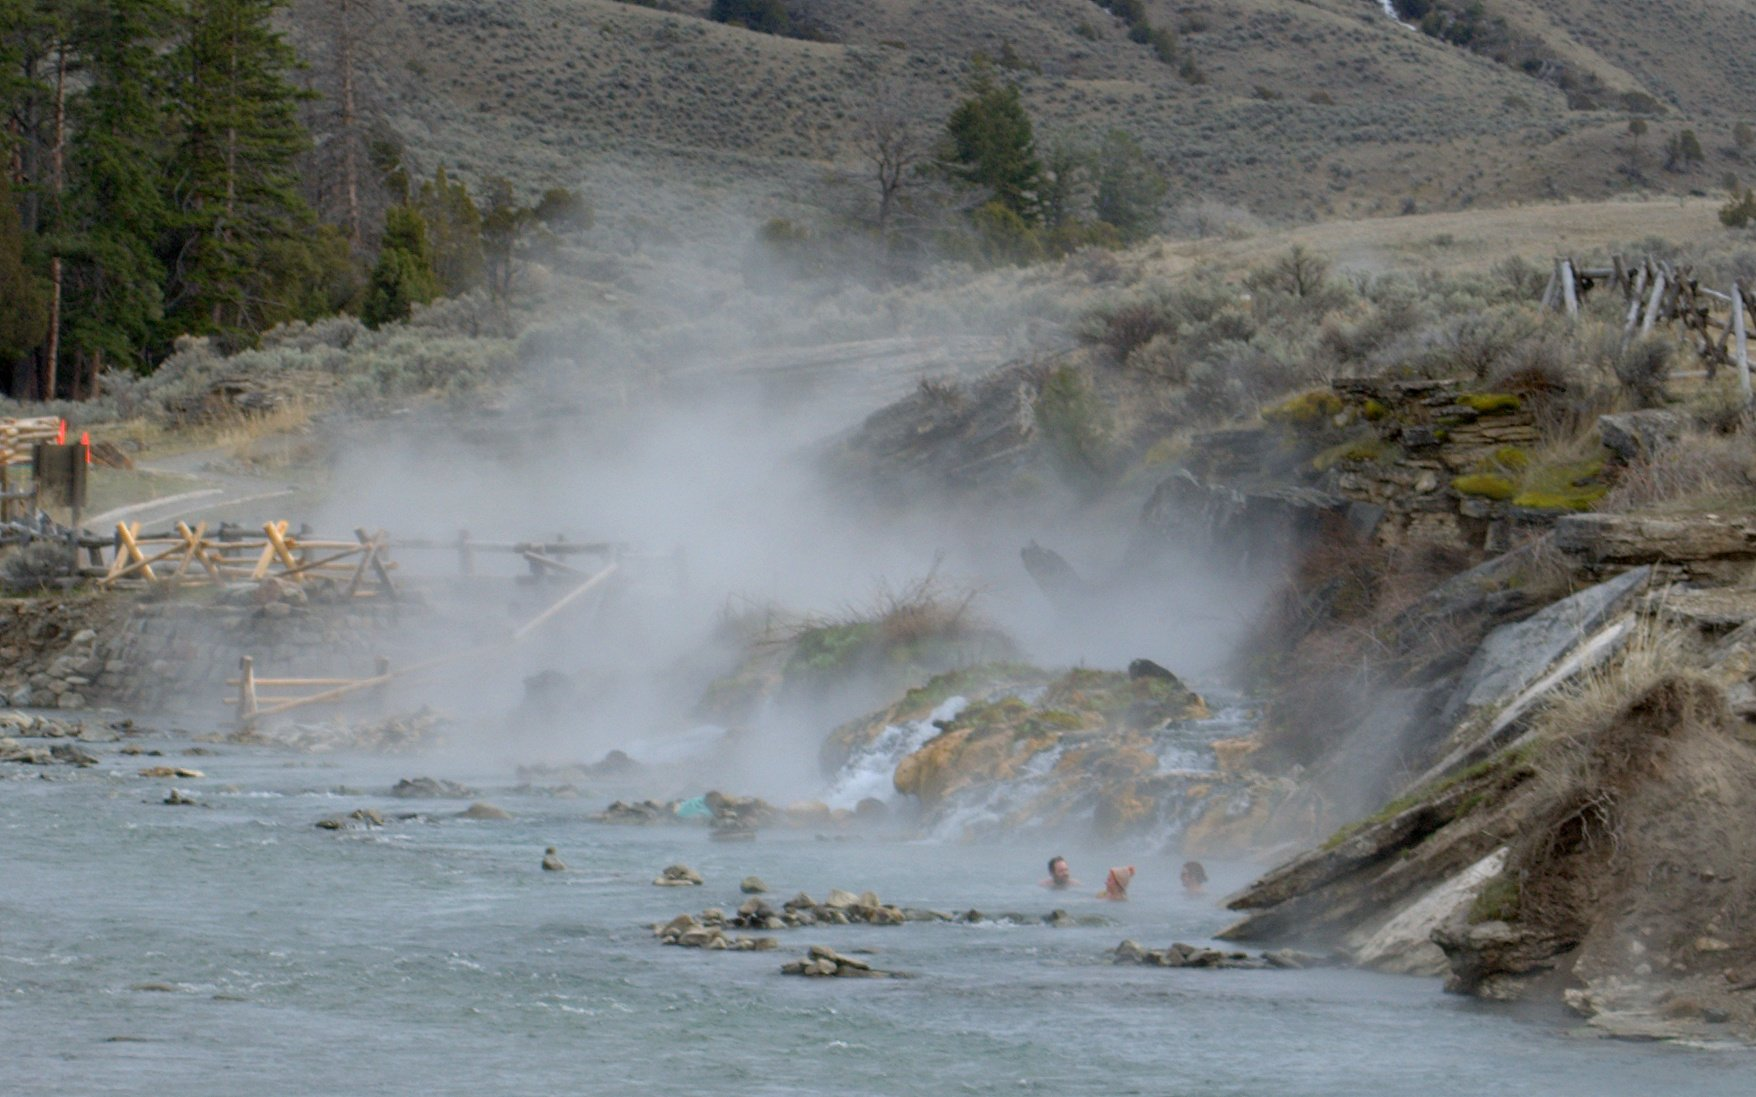 Boiling River - Sasquatch The Bus